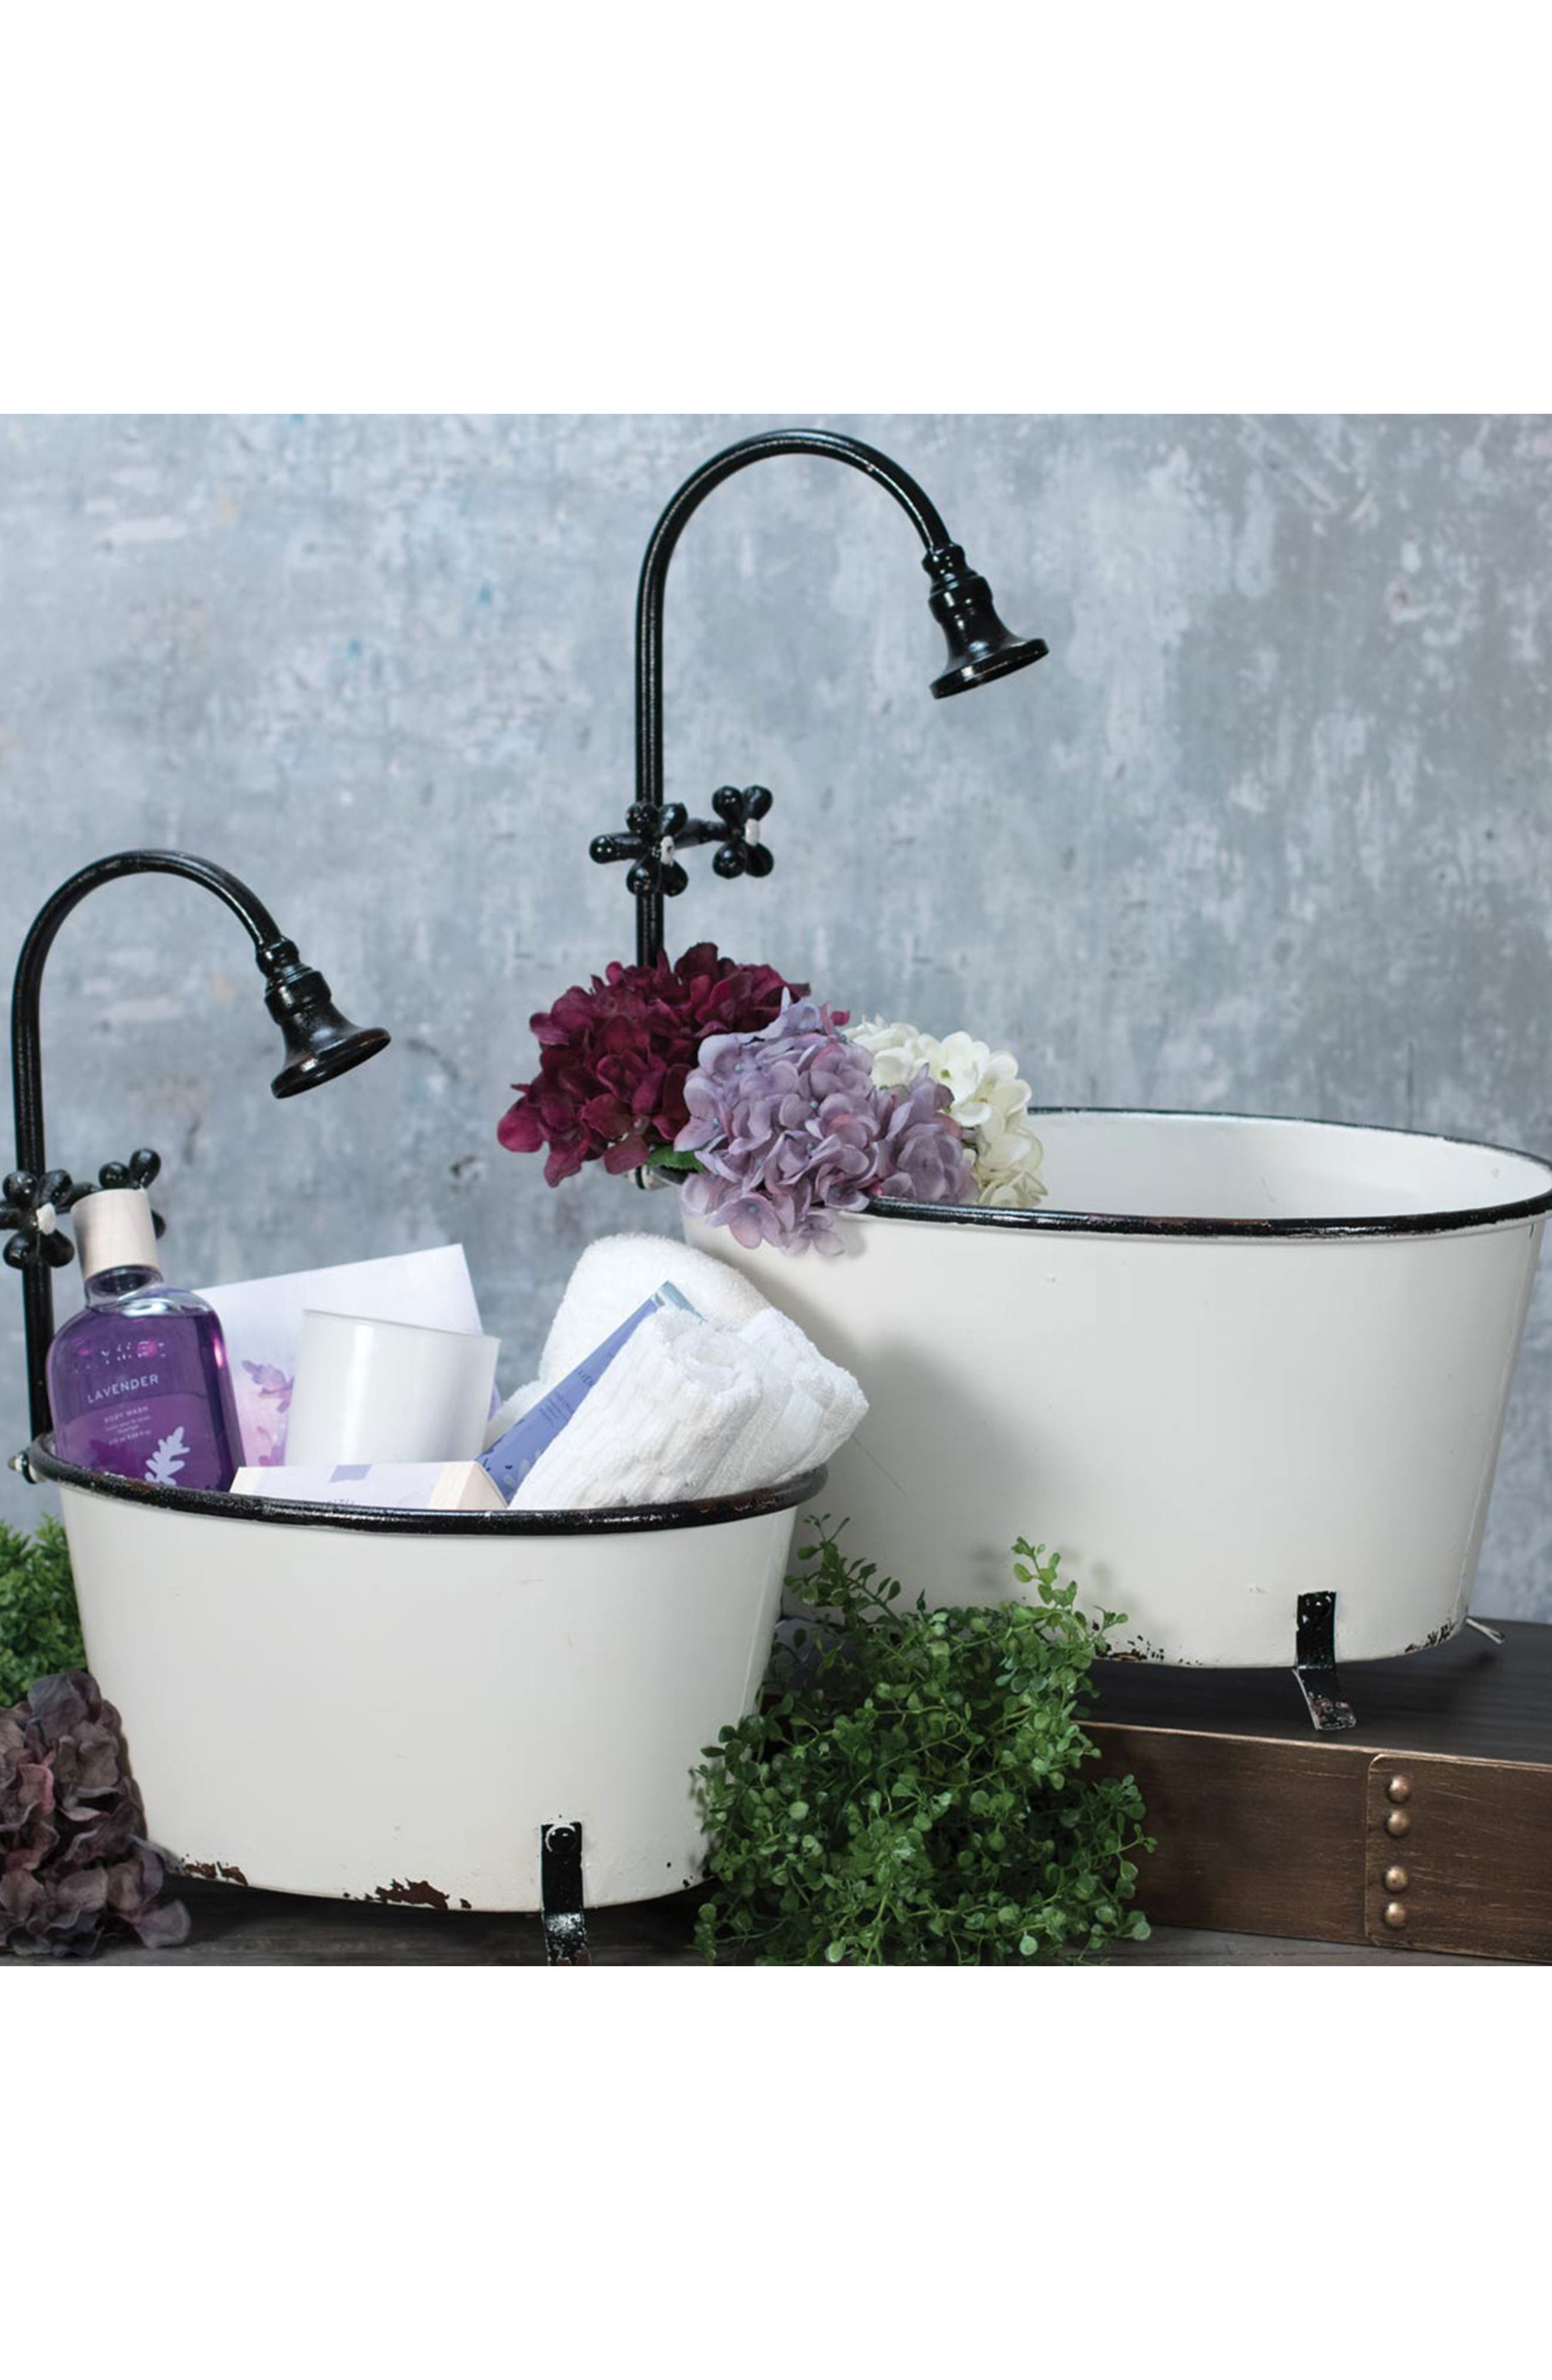 Antique Bathtub Set of 2 Planters,                             Alternate thumbnail 2, color,                             WHITE/BLACK